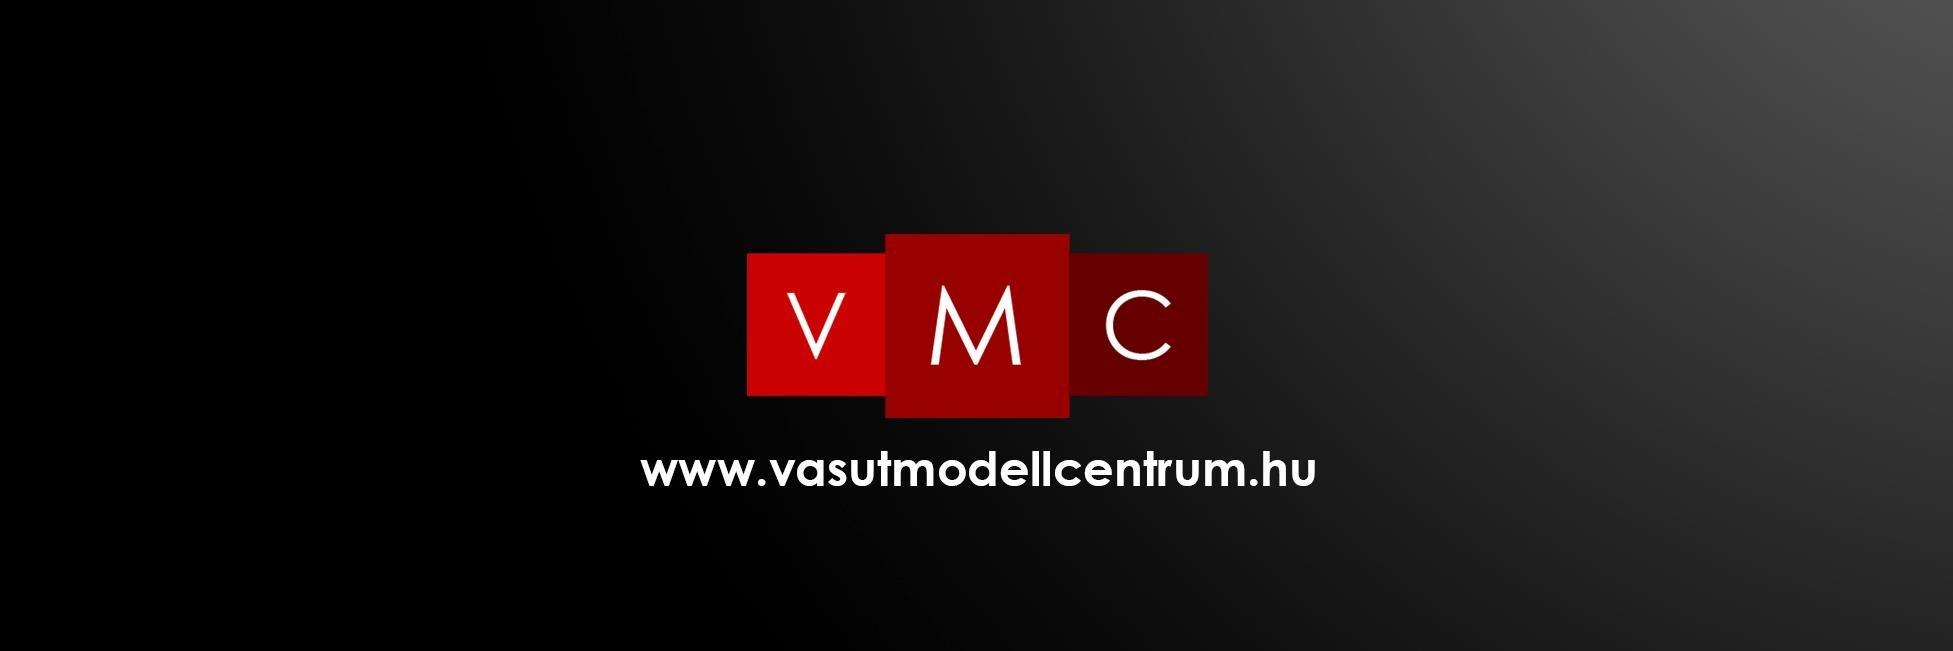 @vasutmodell